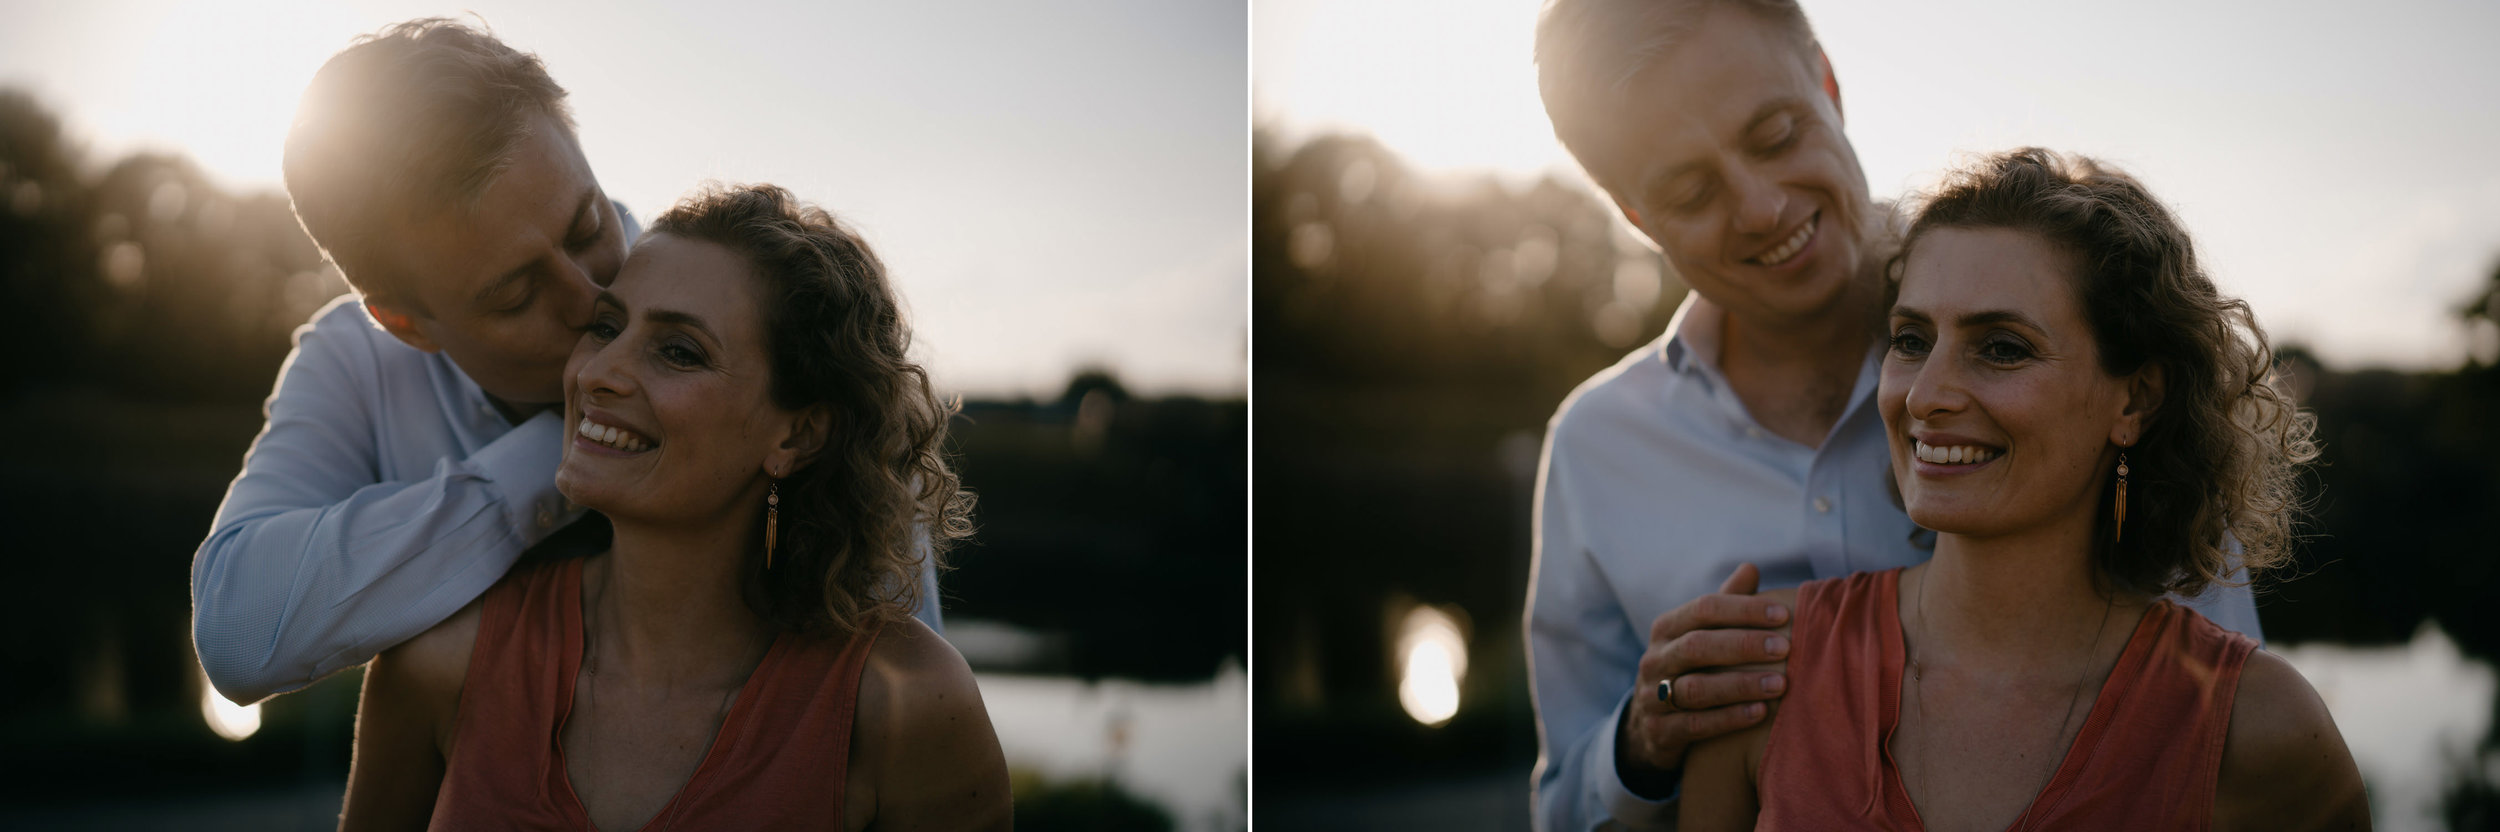 bruidspaar portretten bruidsfotografie amsterdam fotoshoot naarden